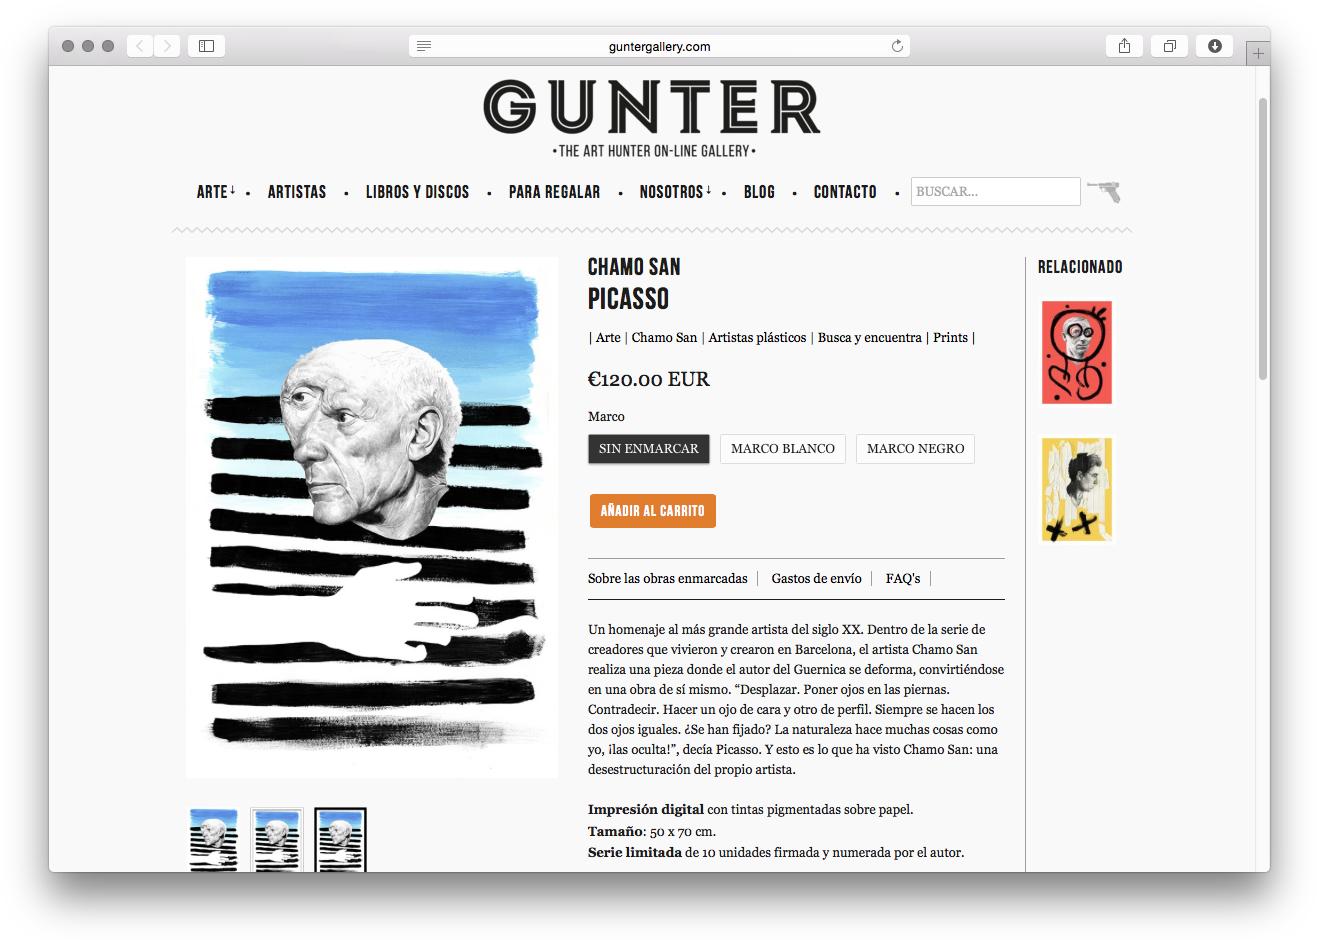 Gunter artists